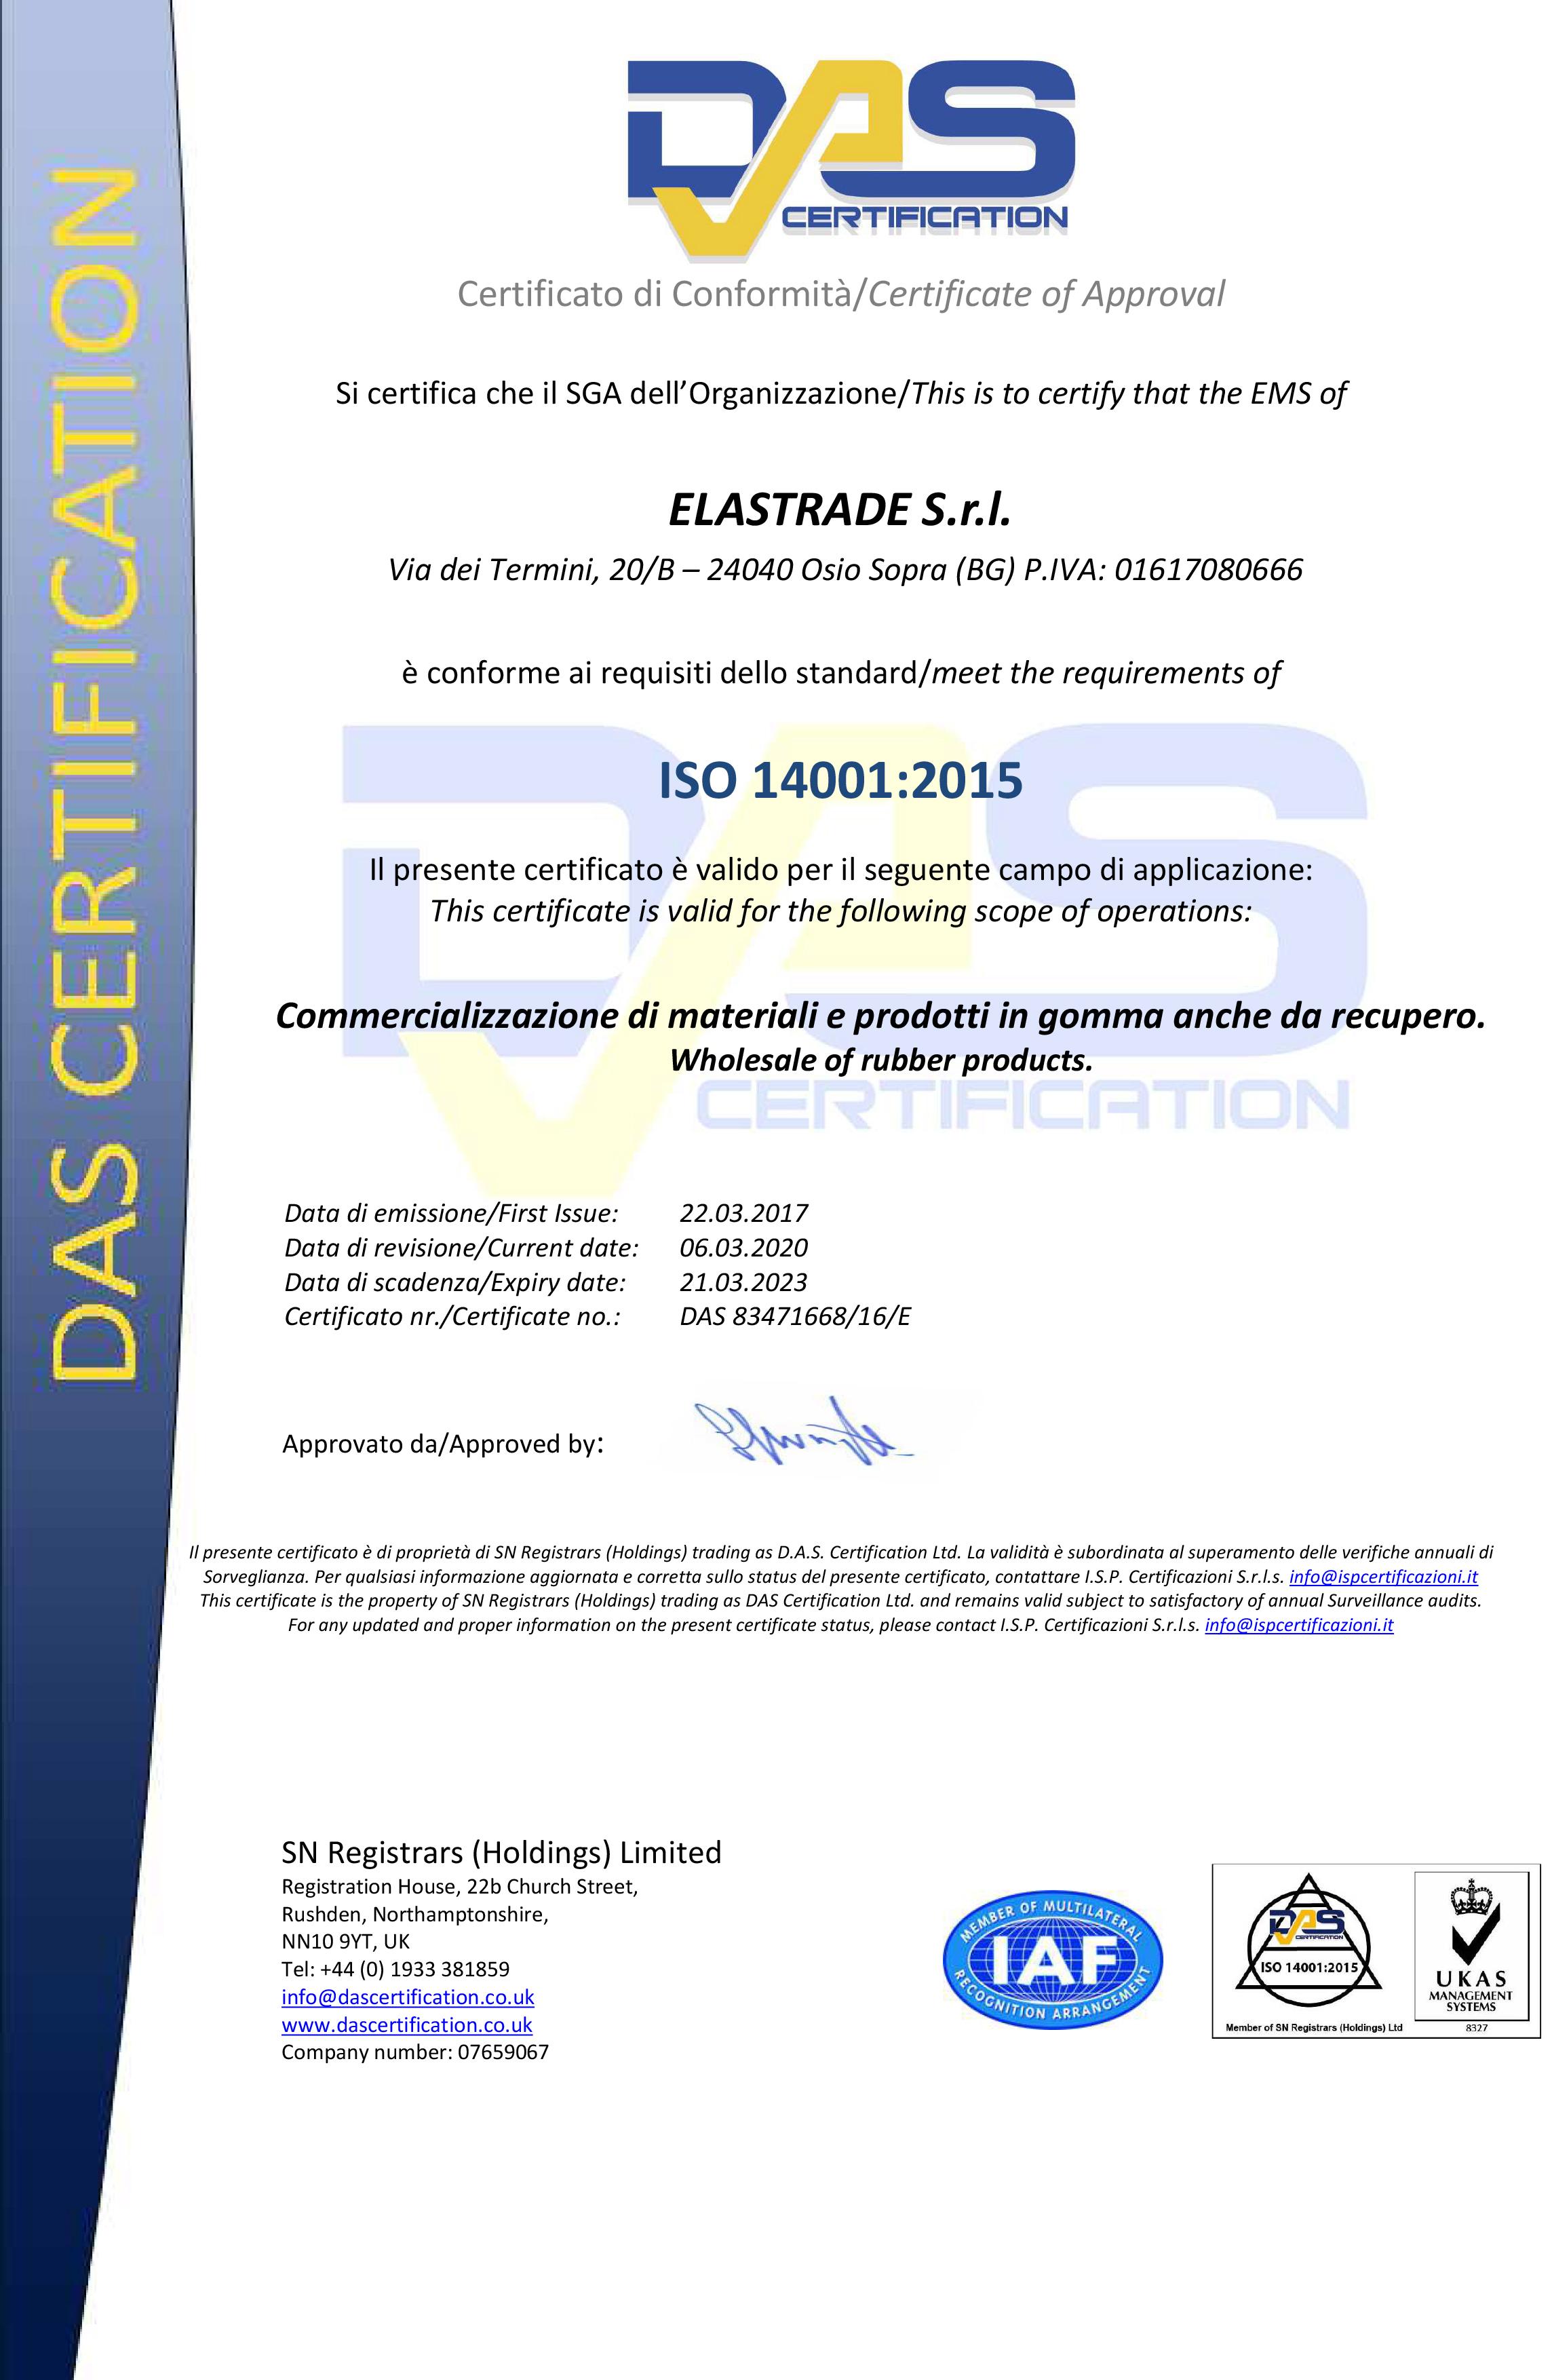 das certification ISO 14001:2015